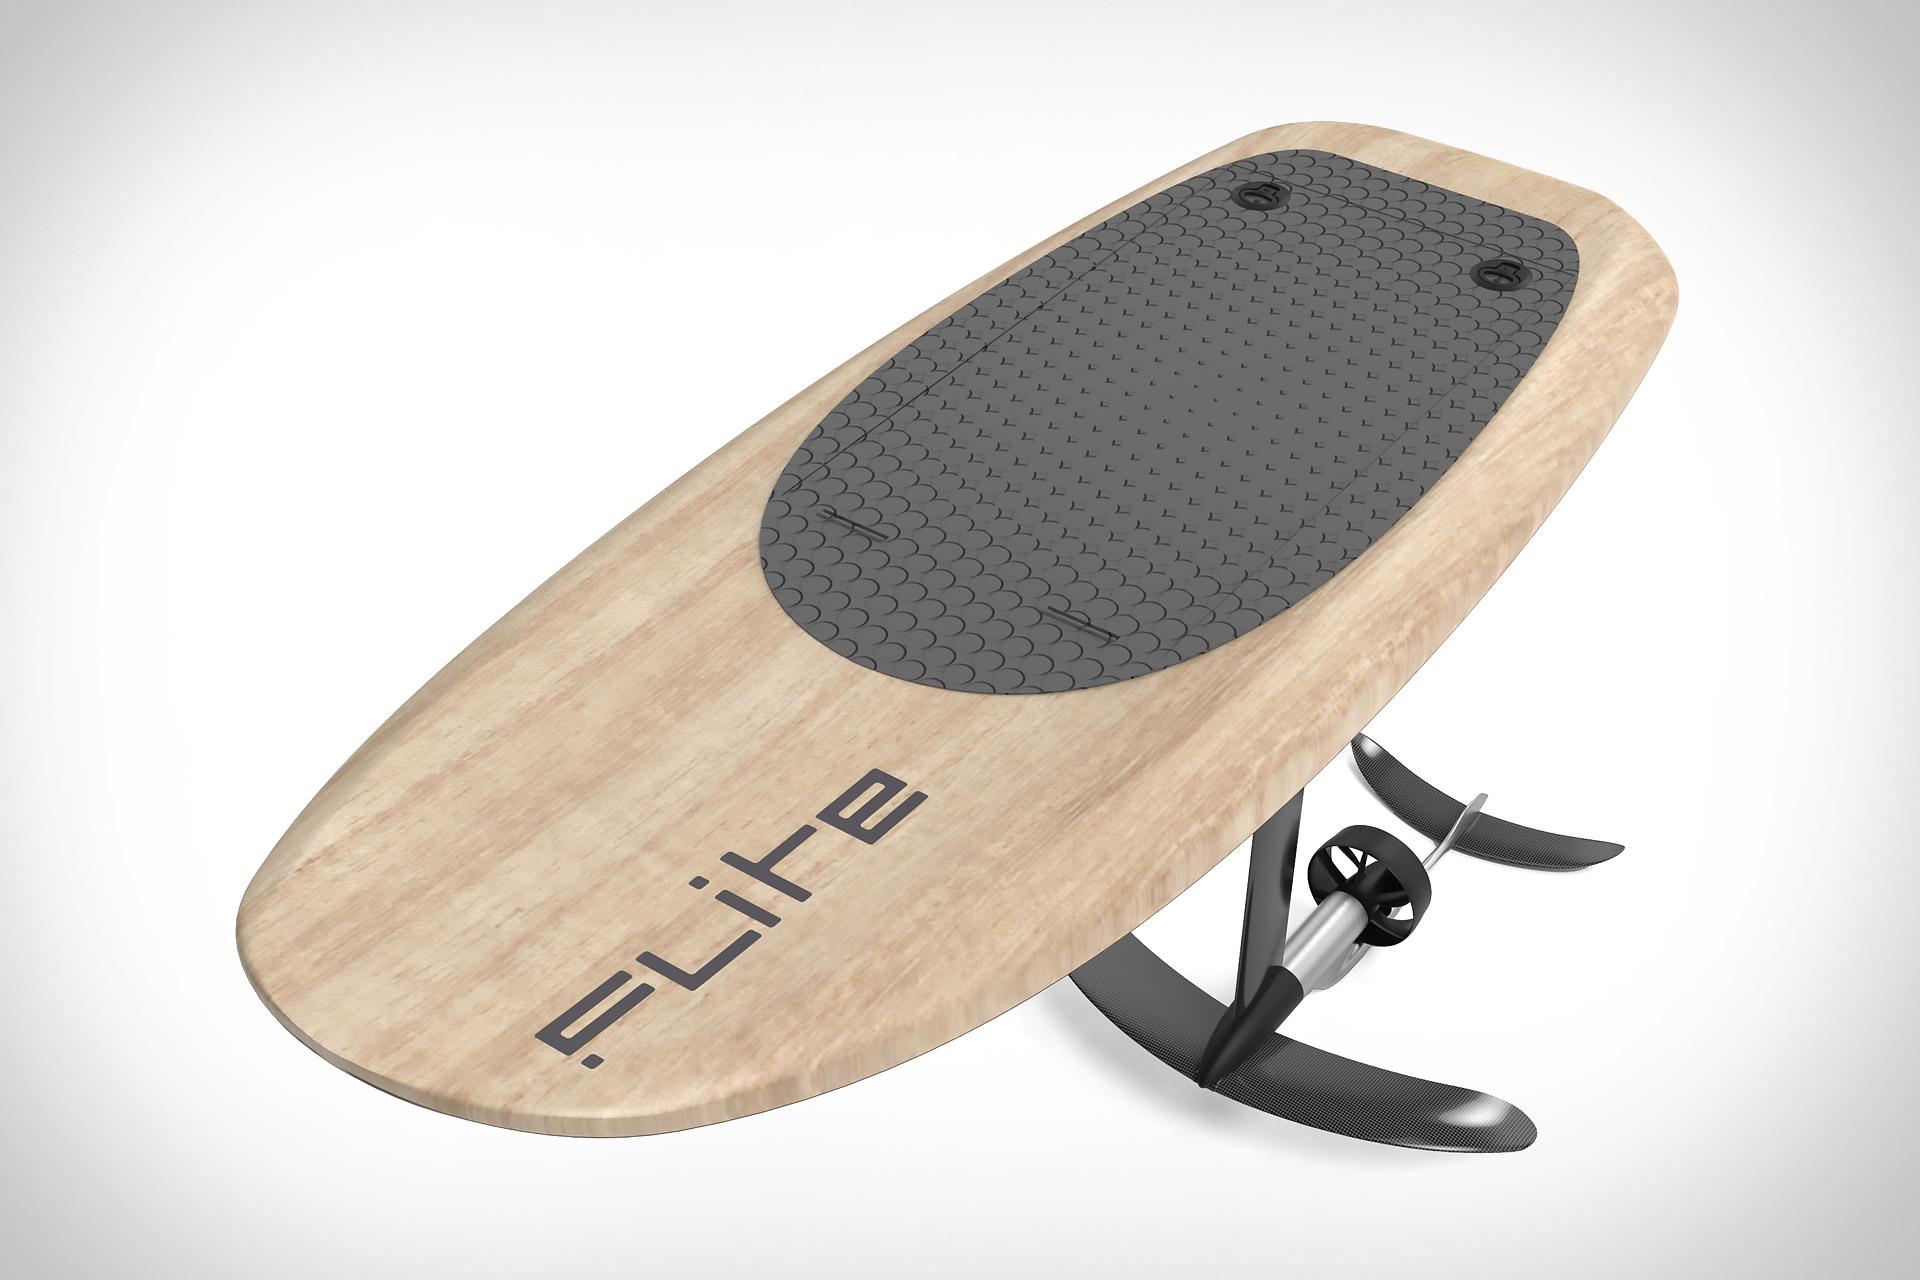 Fliteboard Electric Hydrofoil Surfboard Uncrate